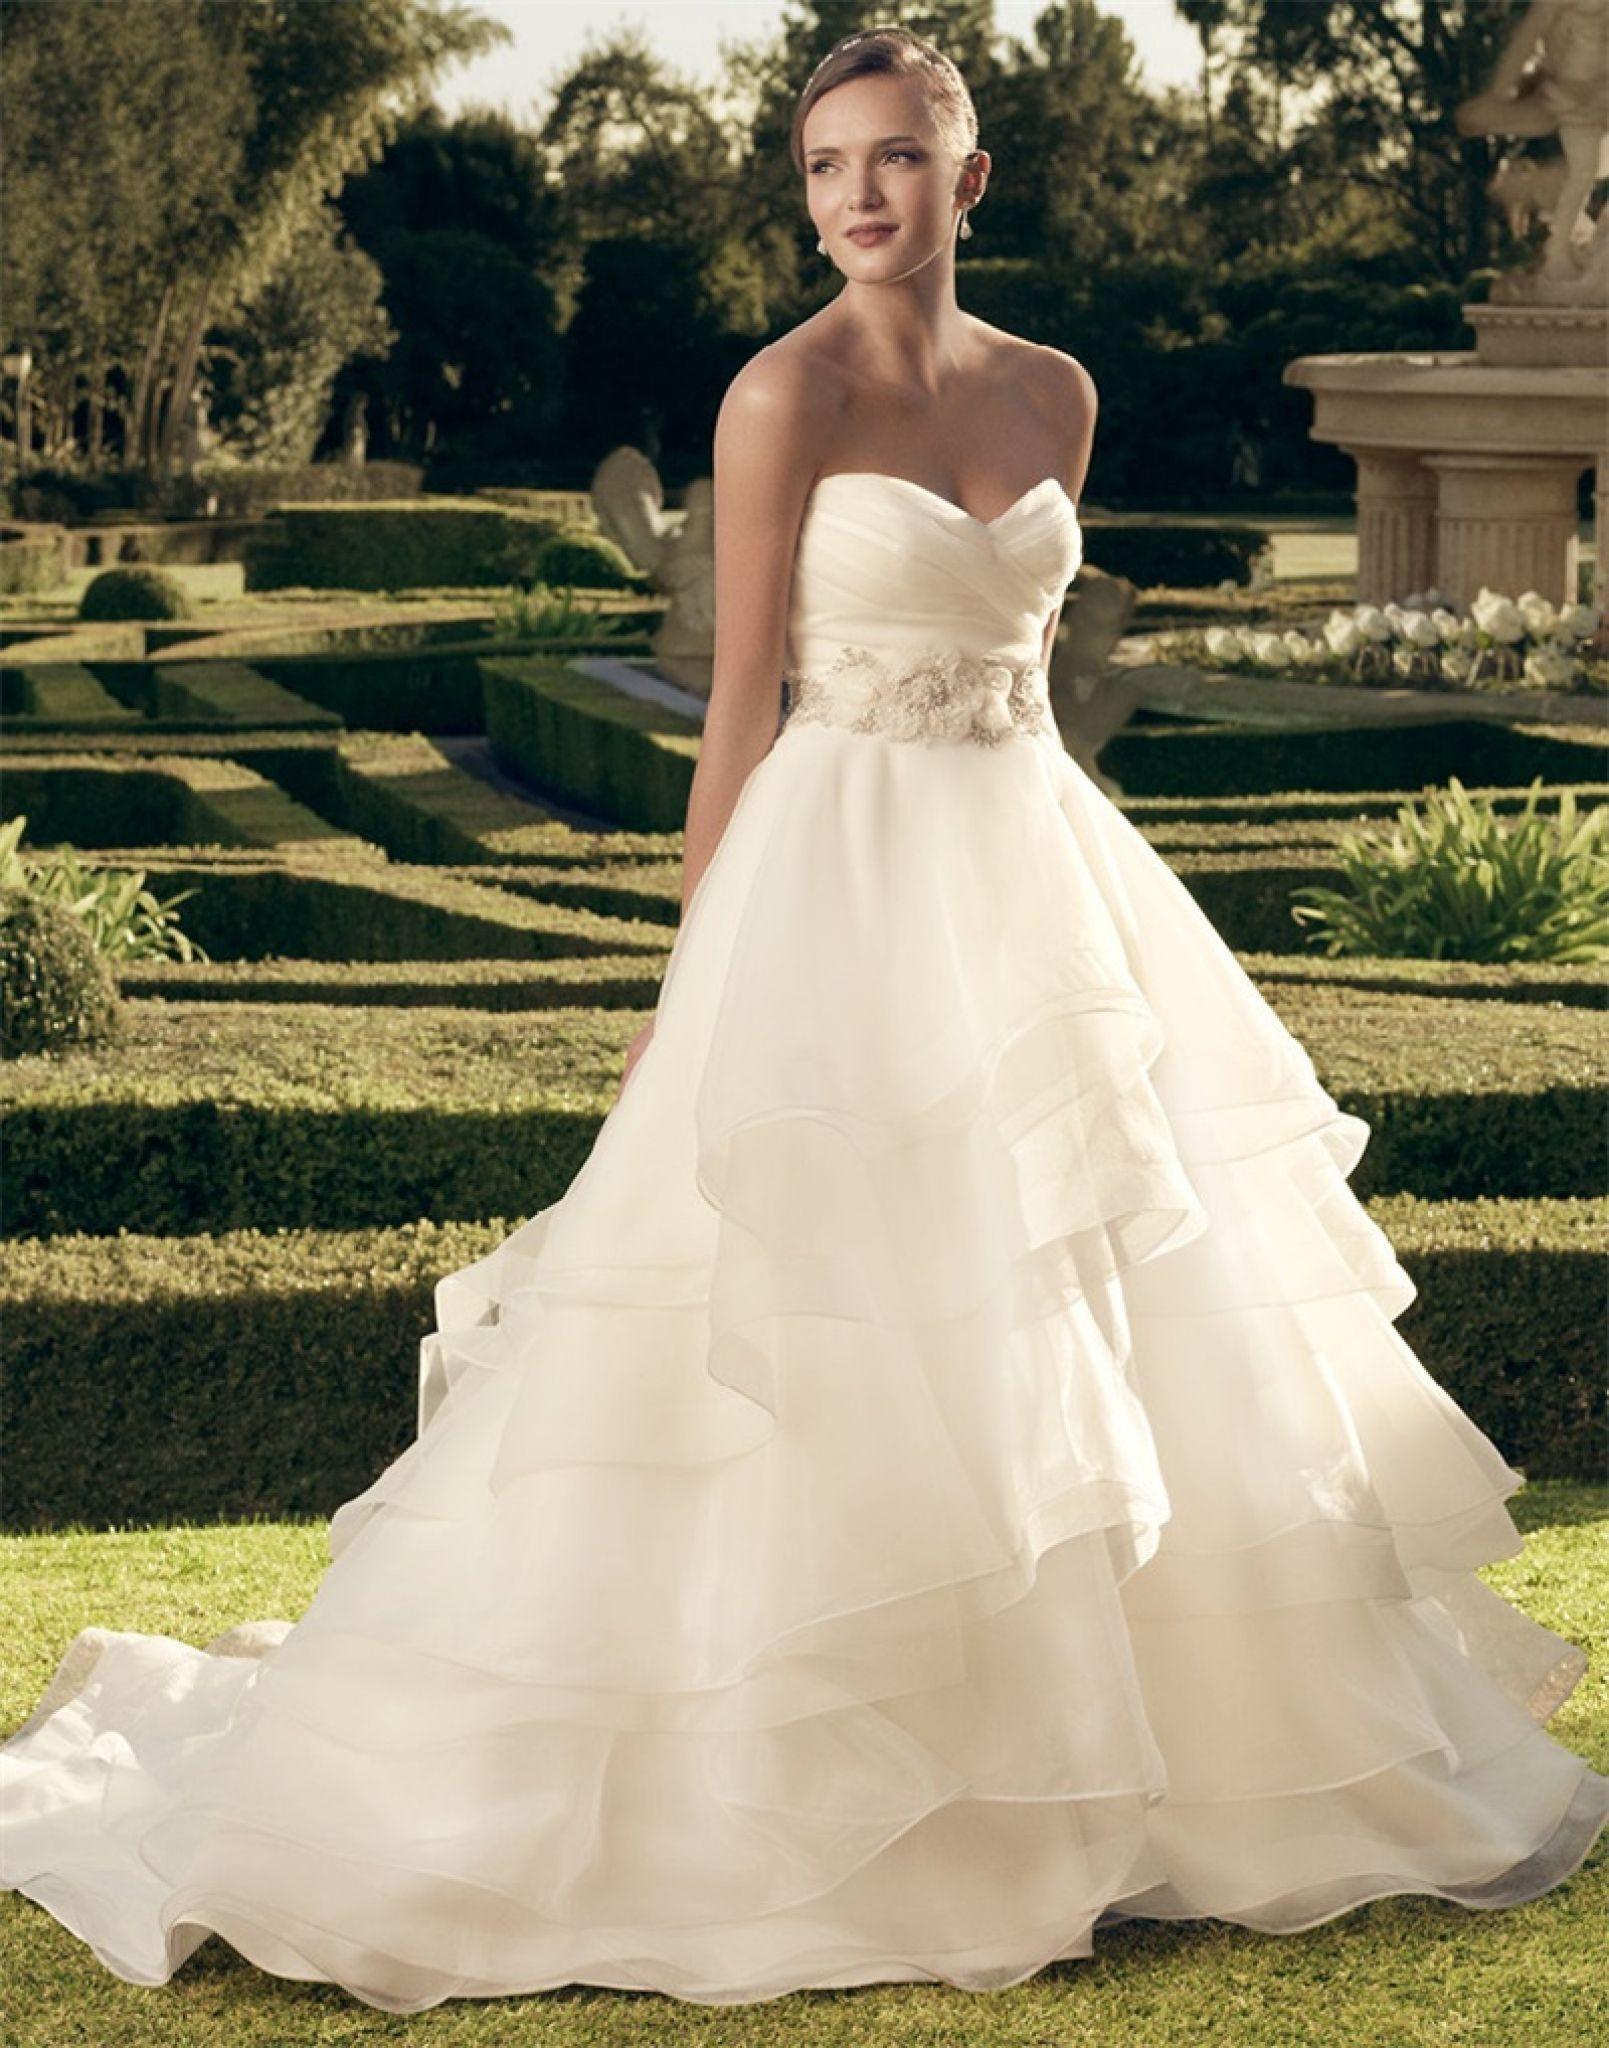 Flowy wedding dress with sleeves  light flowy wedding dresses  wedding dresses for guests Check more